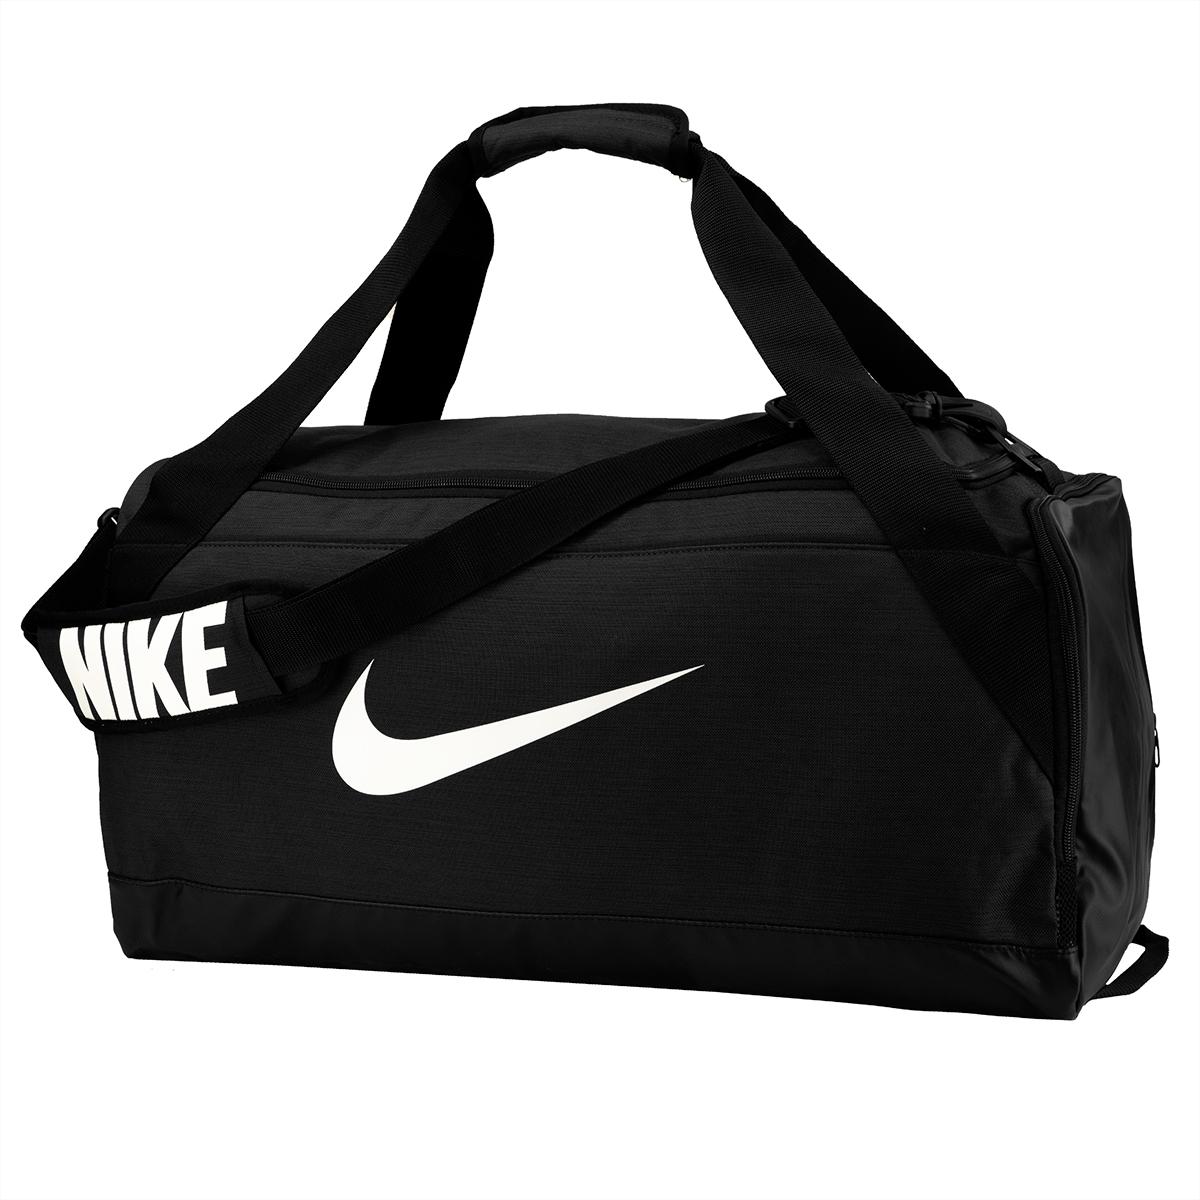 Nike Brasilia Medium Duffel Bag Black White  1e7125901e36b